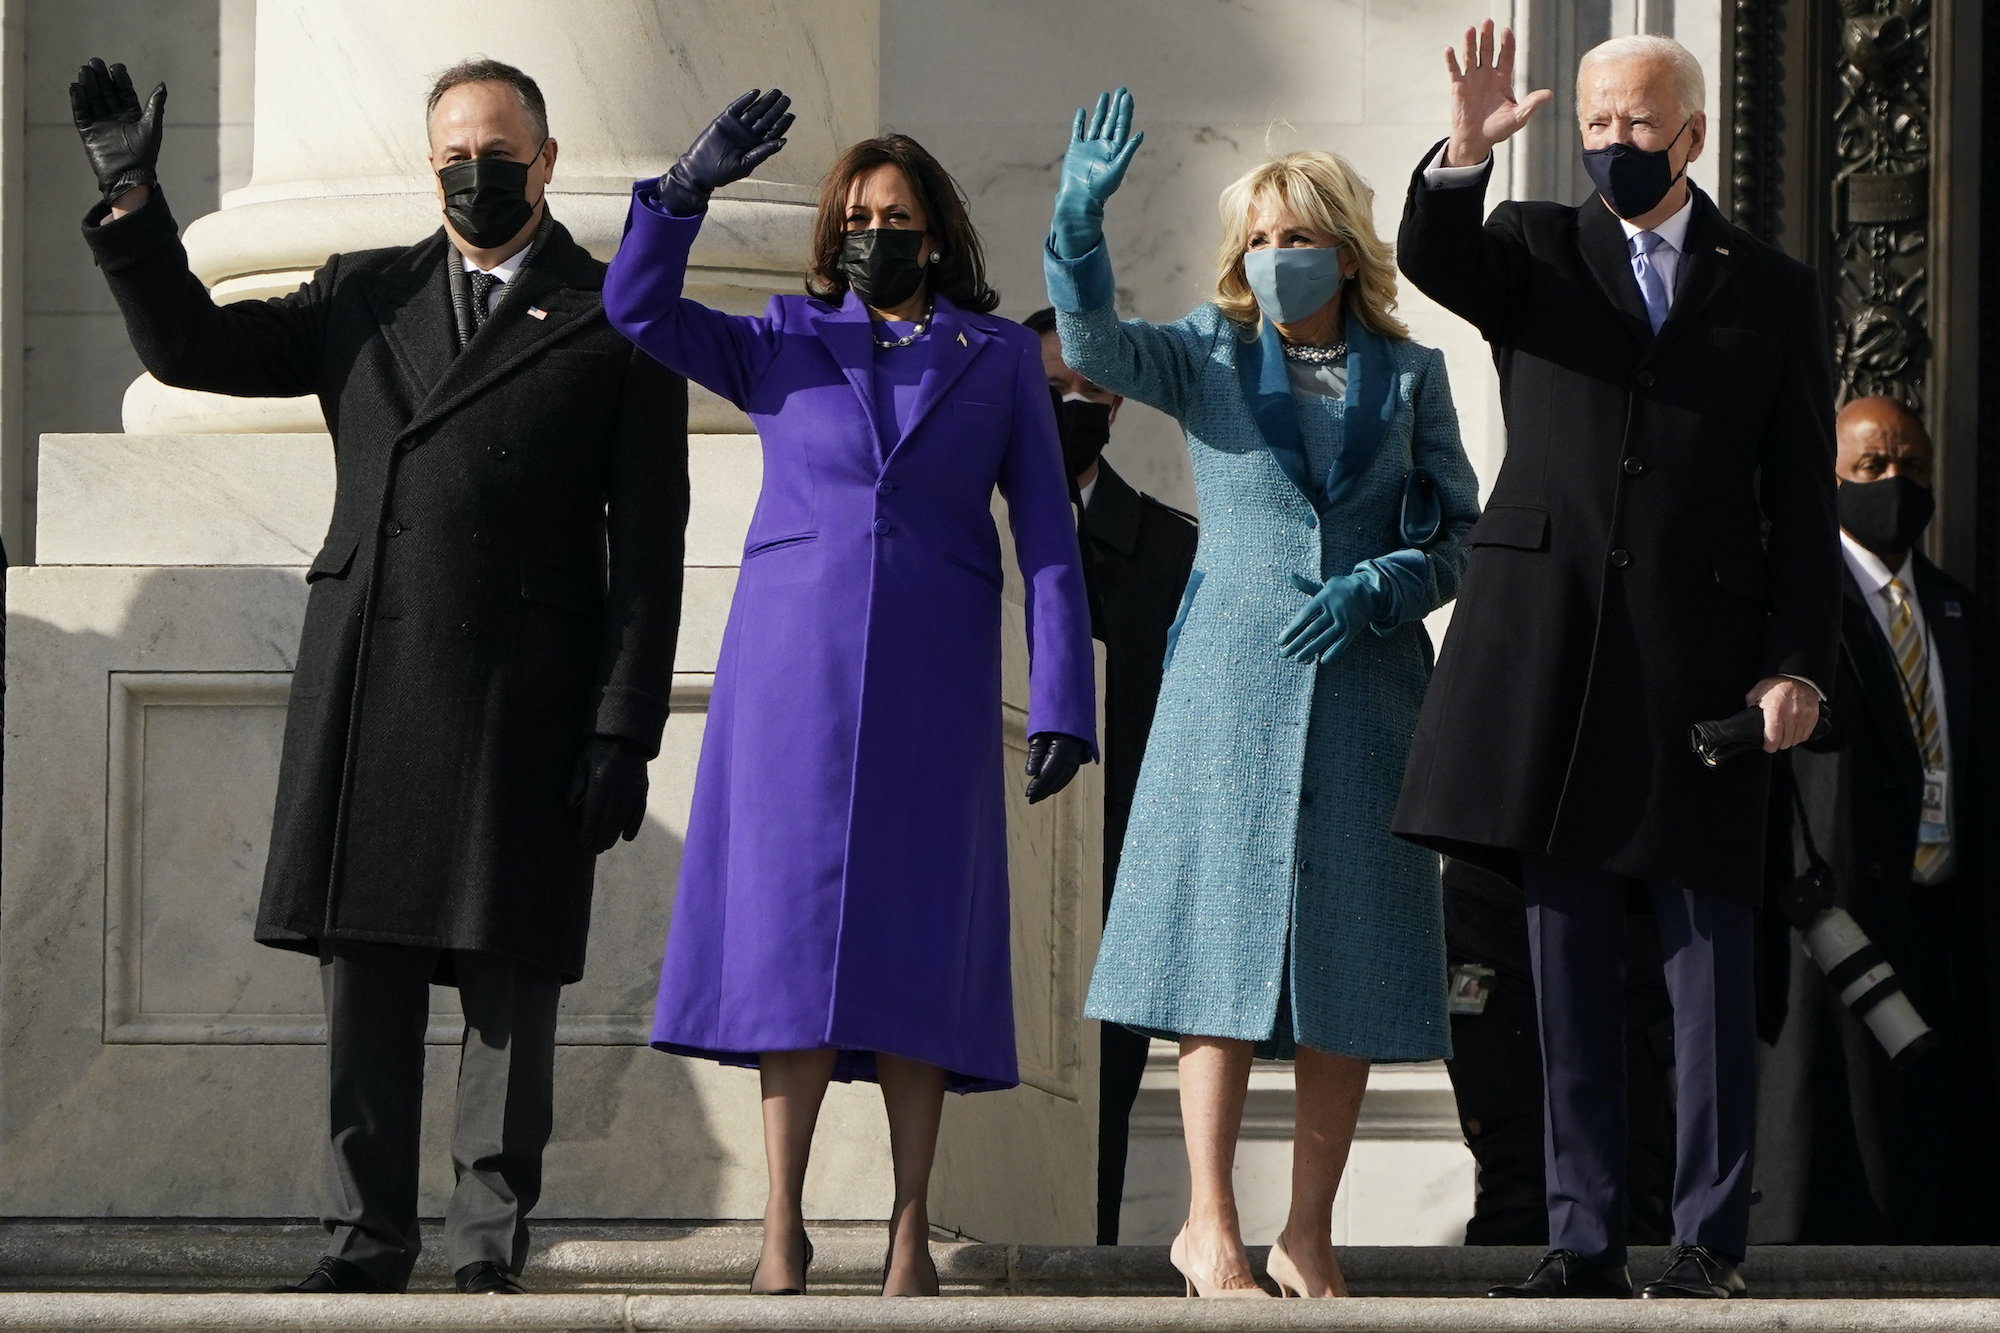 President-elect Joe Biden, his wife Jill Biden and Vice President-elect Kamala Harris and her husband Doug Emhoff arrive at the steps of the U.S. Capitol